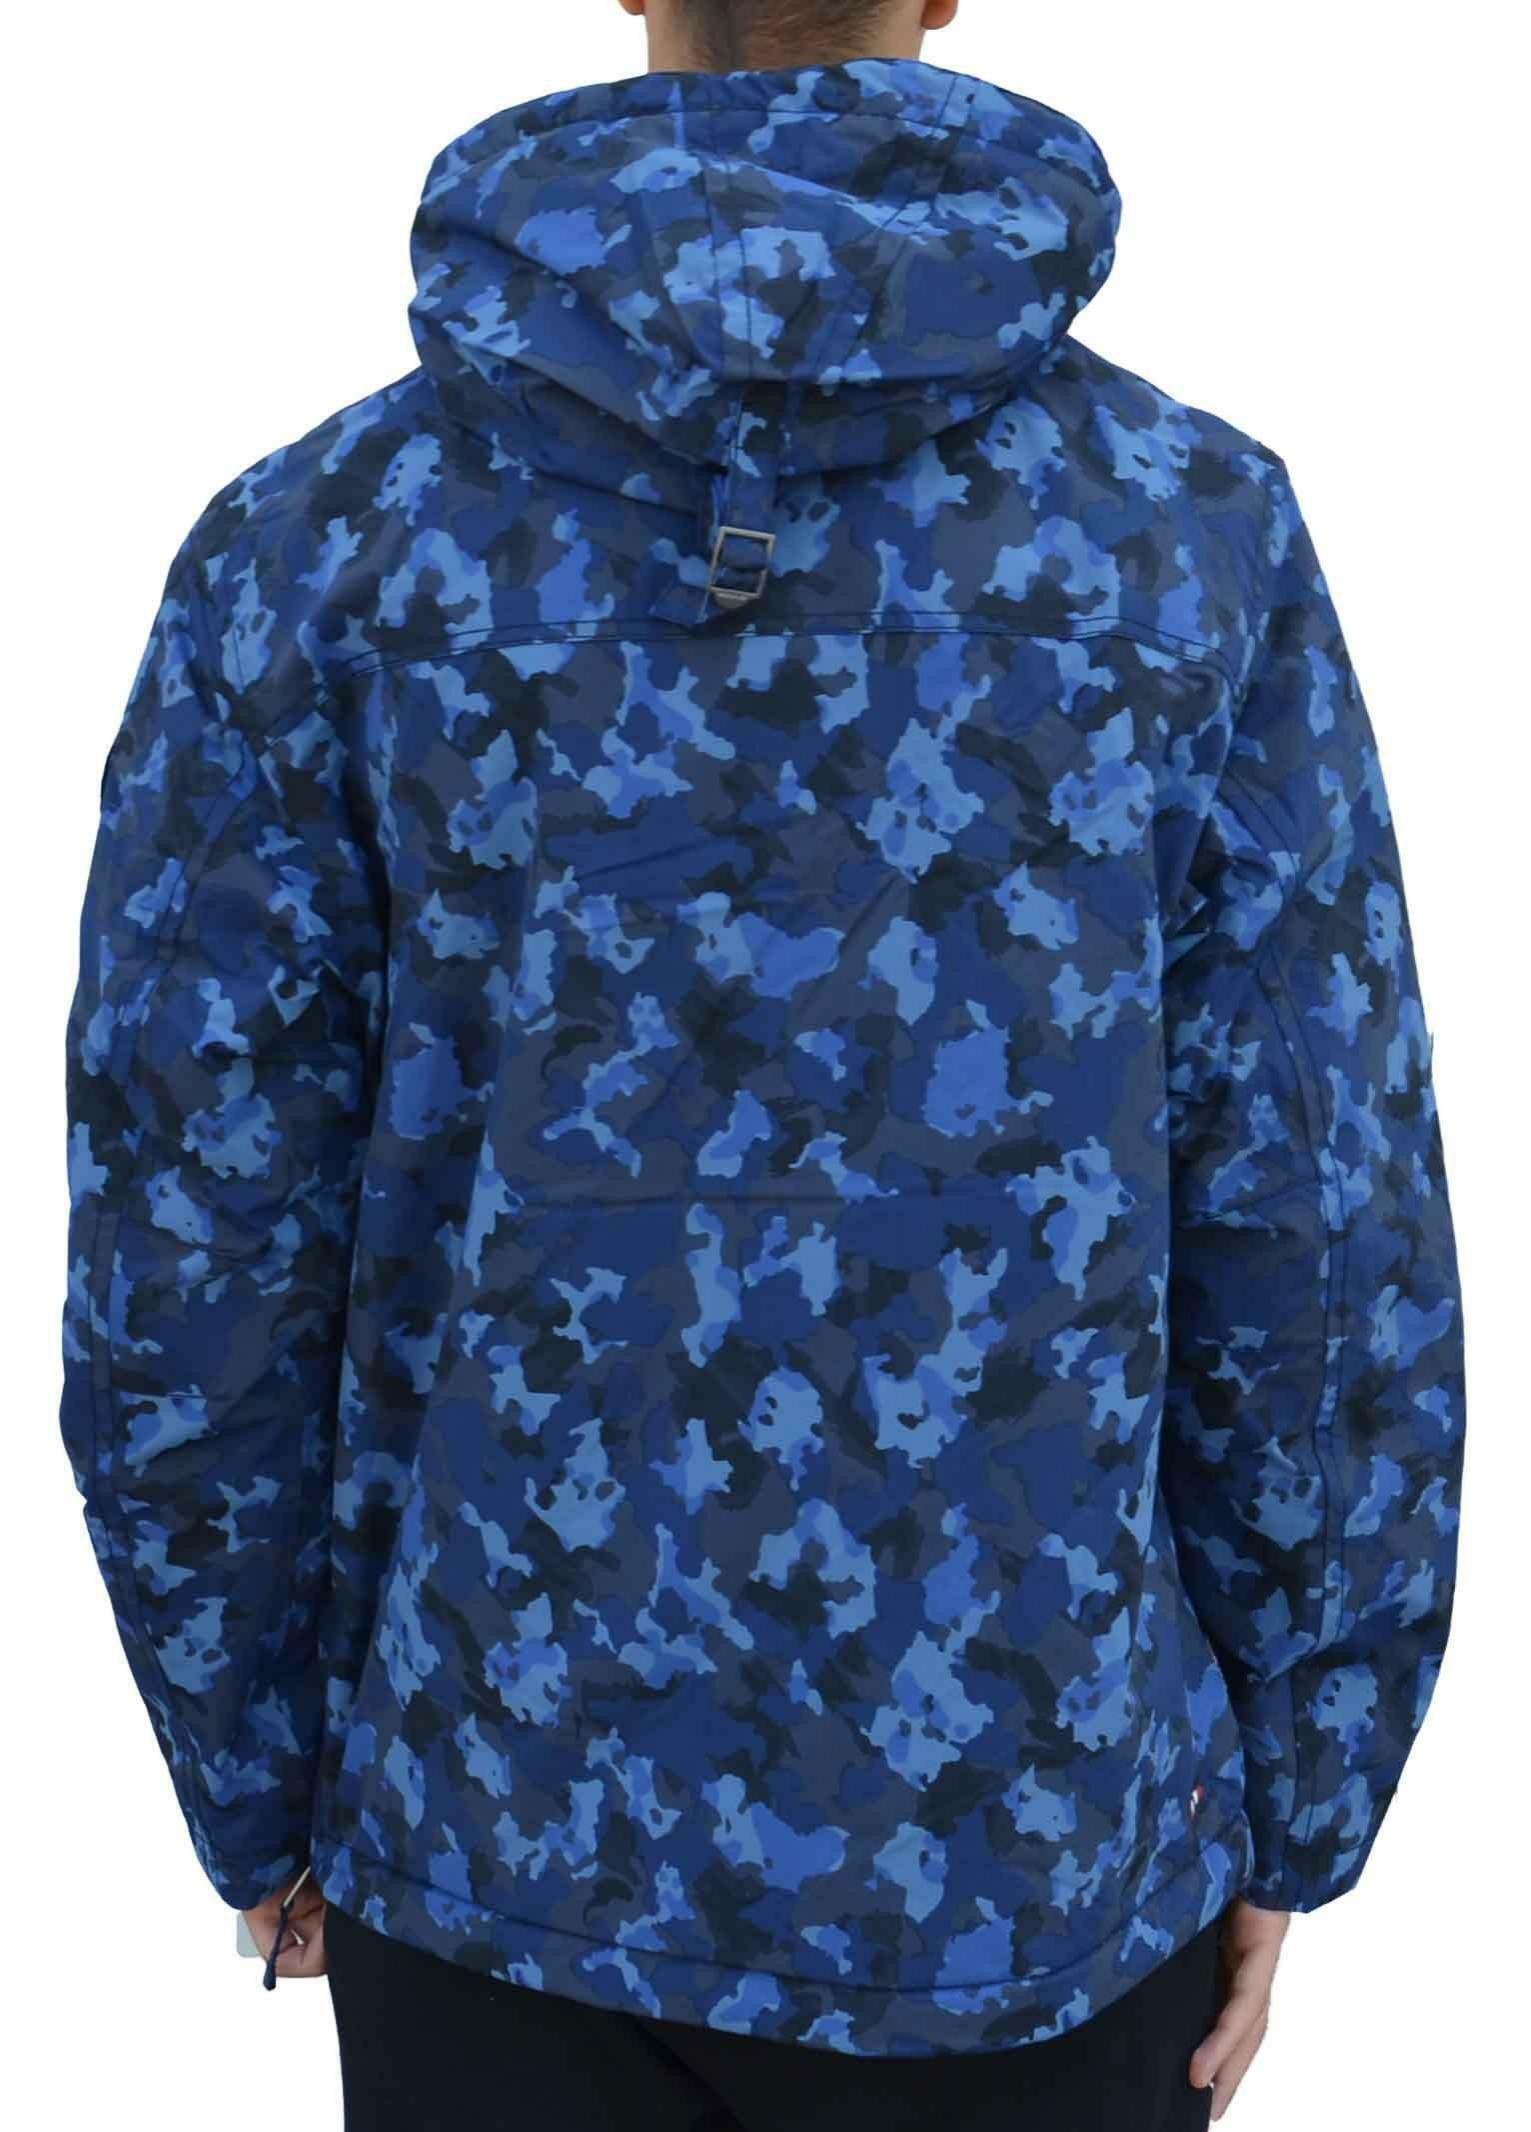 napapijri giubbotto marsupio napapijri rainforest print n0yhvbf87 blu camouflage